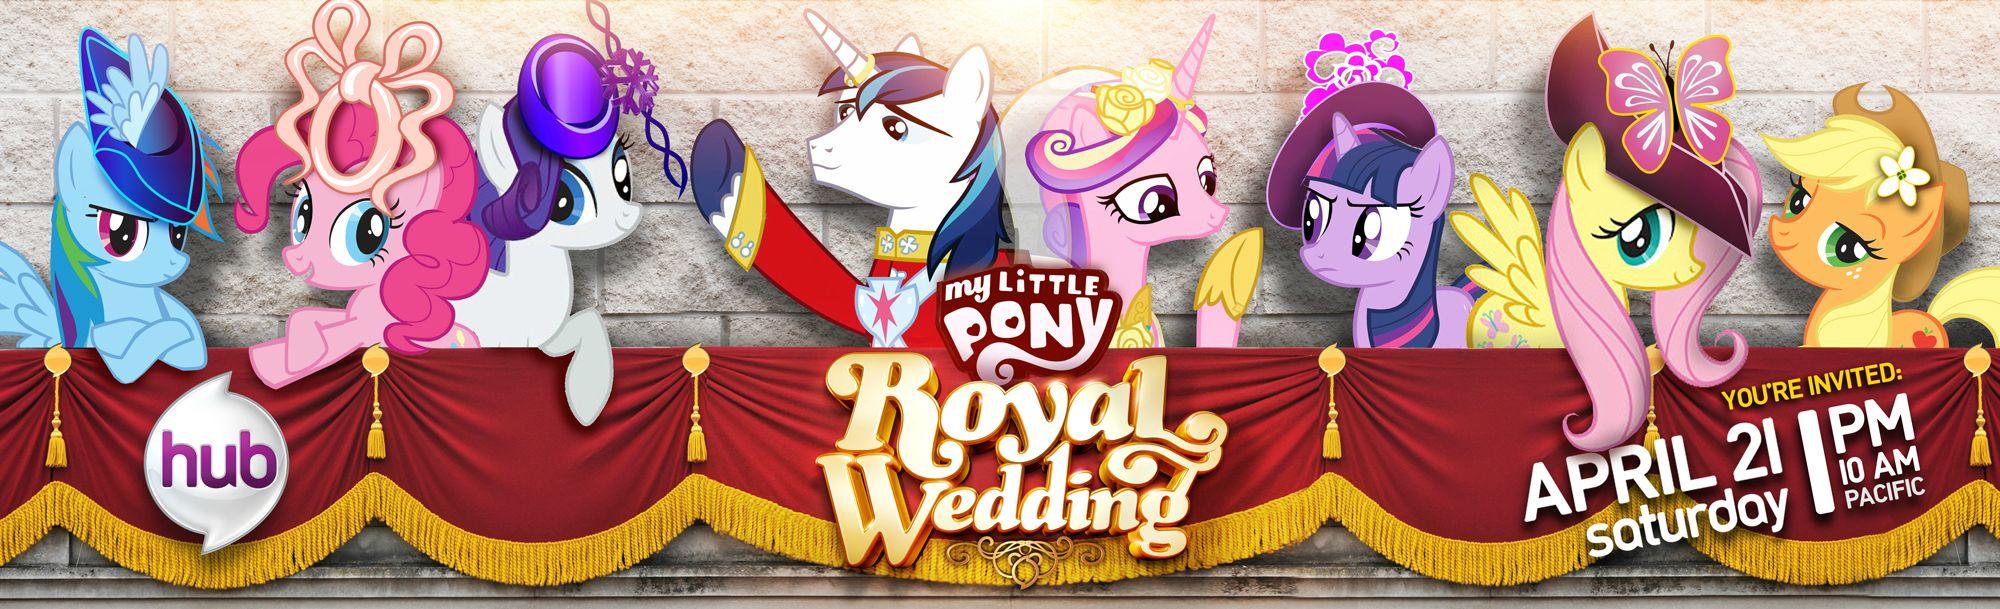 Royal Wedding Hub Promo Poster Jpg